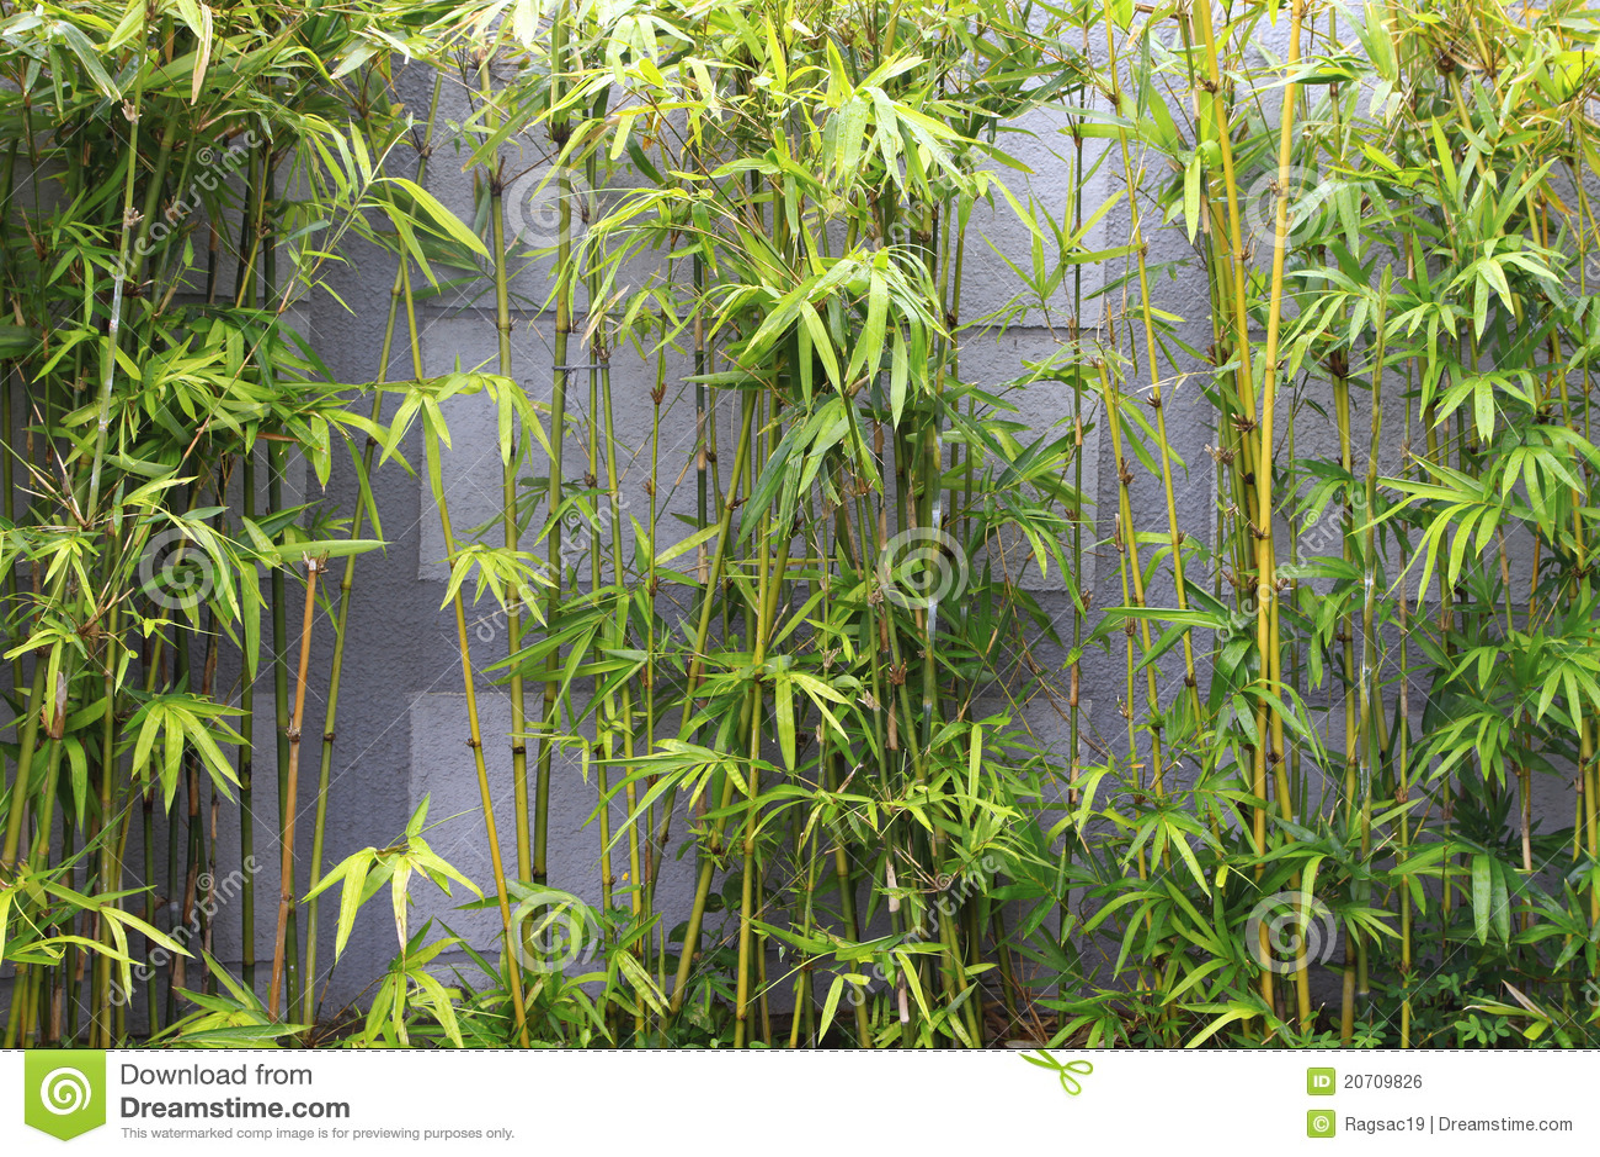 Jard n de bamb imagen de archivo libre de regal as imagen 20709826 - Jardin de bambu talavera ...